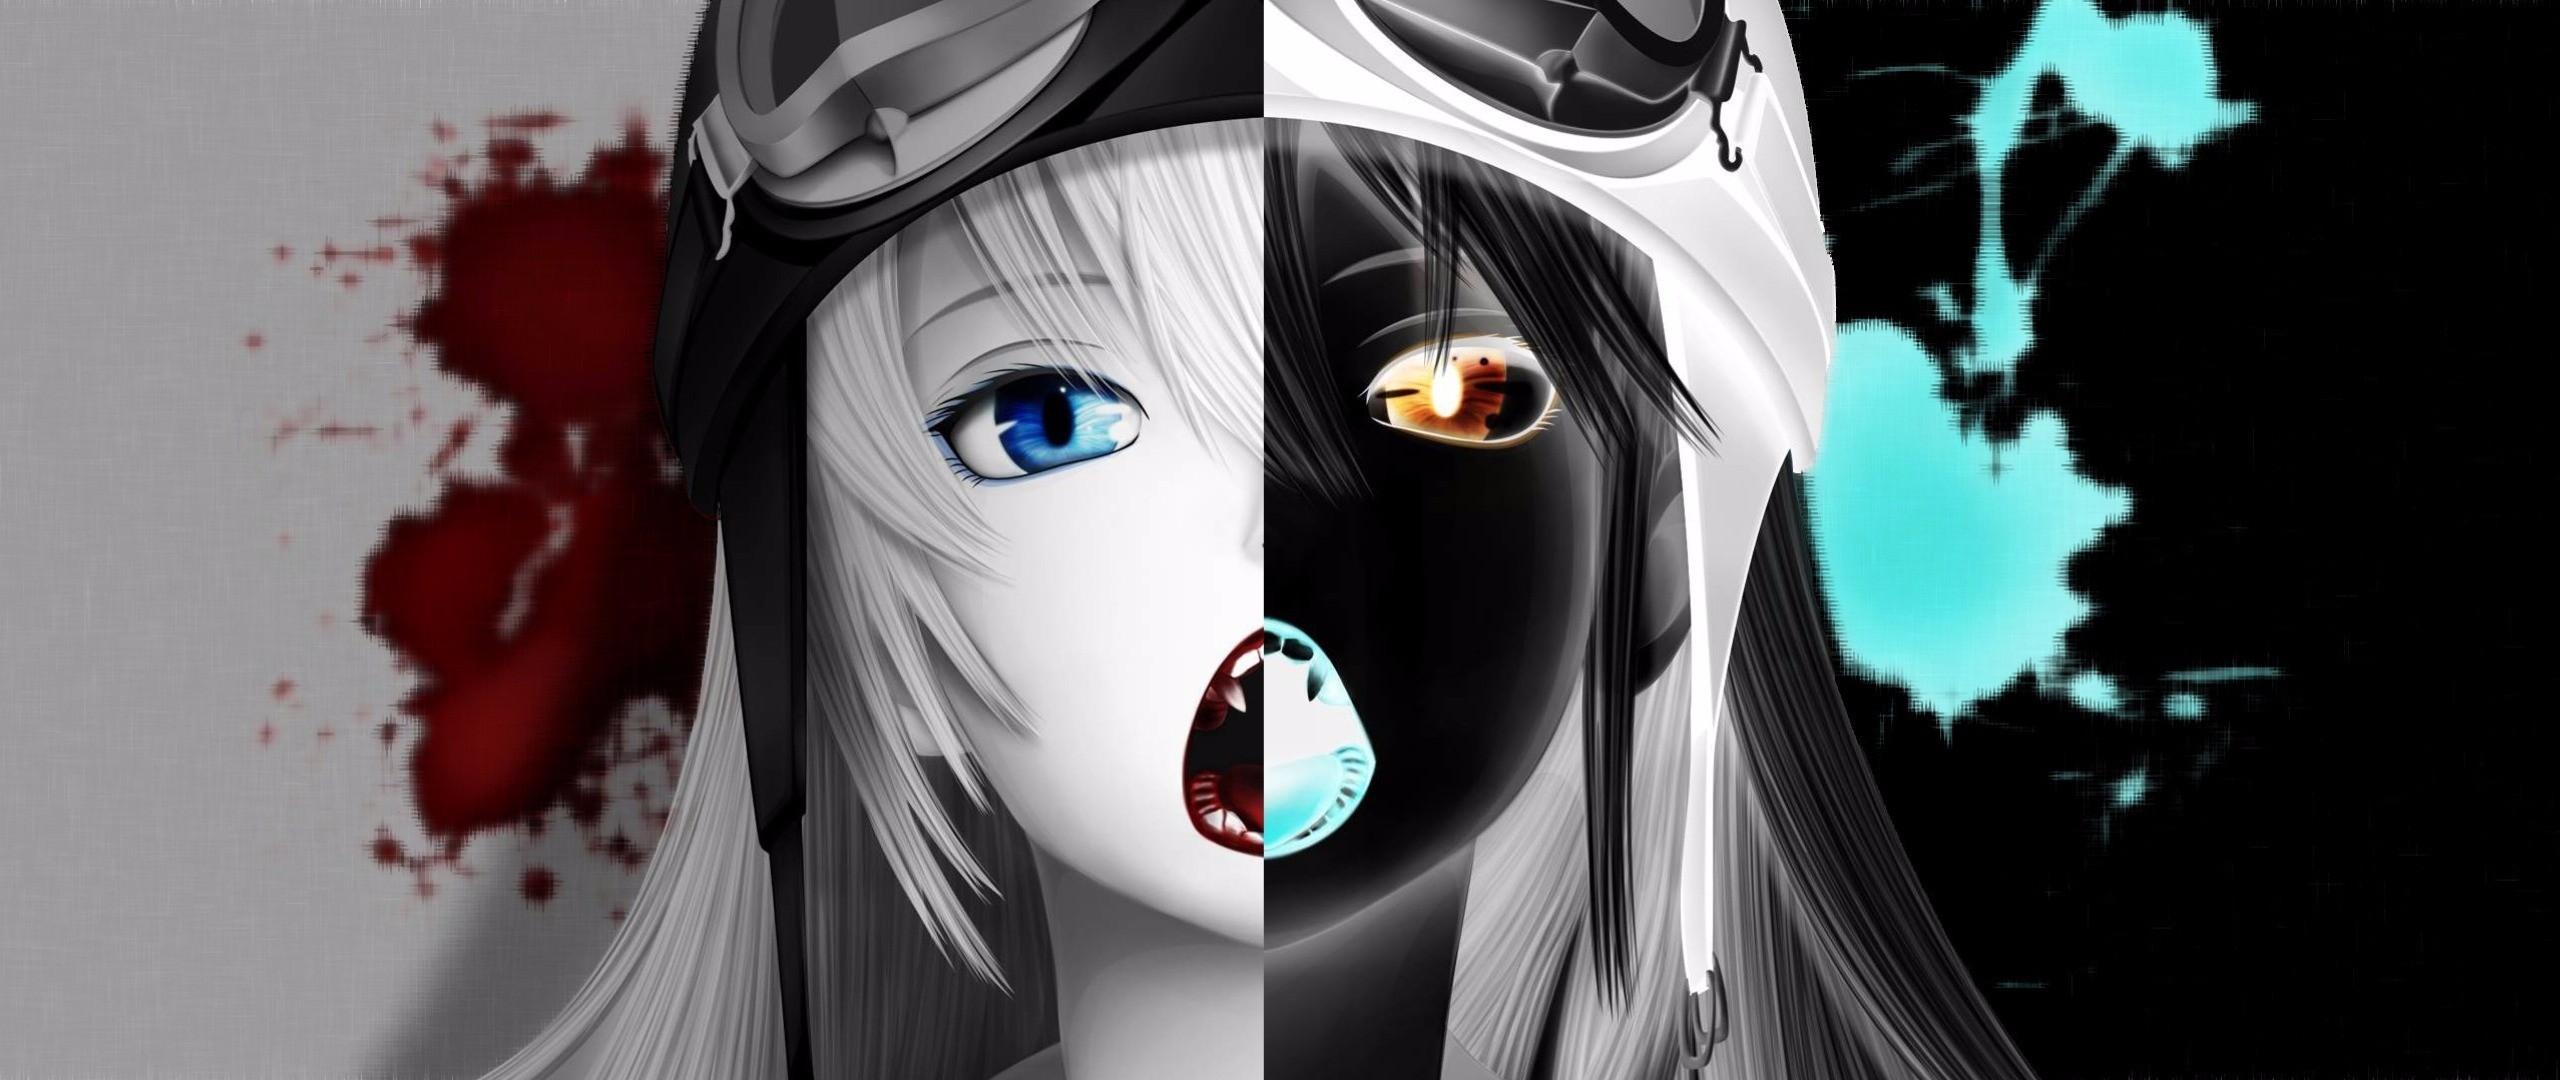 Anime anime multiple display inverted Monogatari Series Oshino  Shinobu blood anime girls